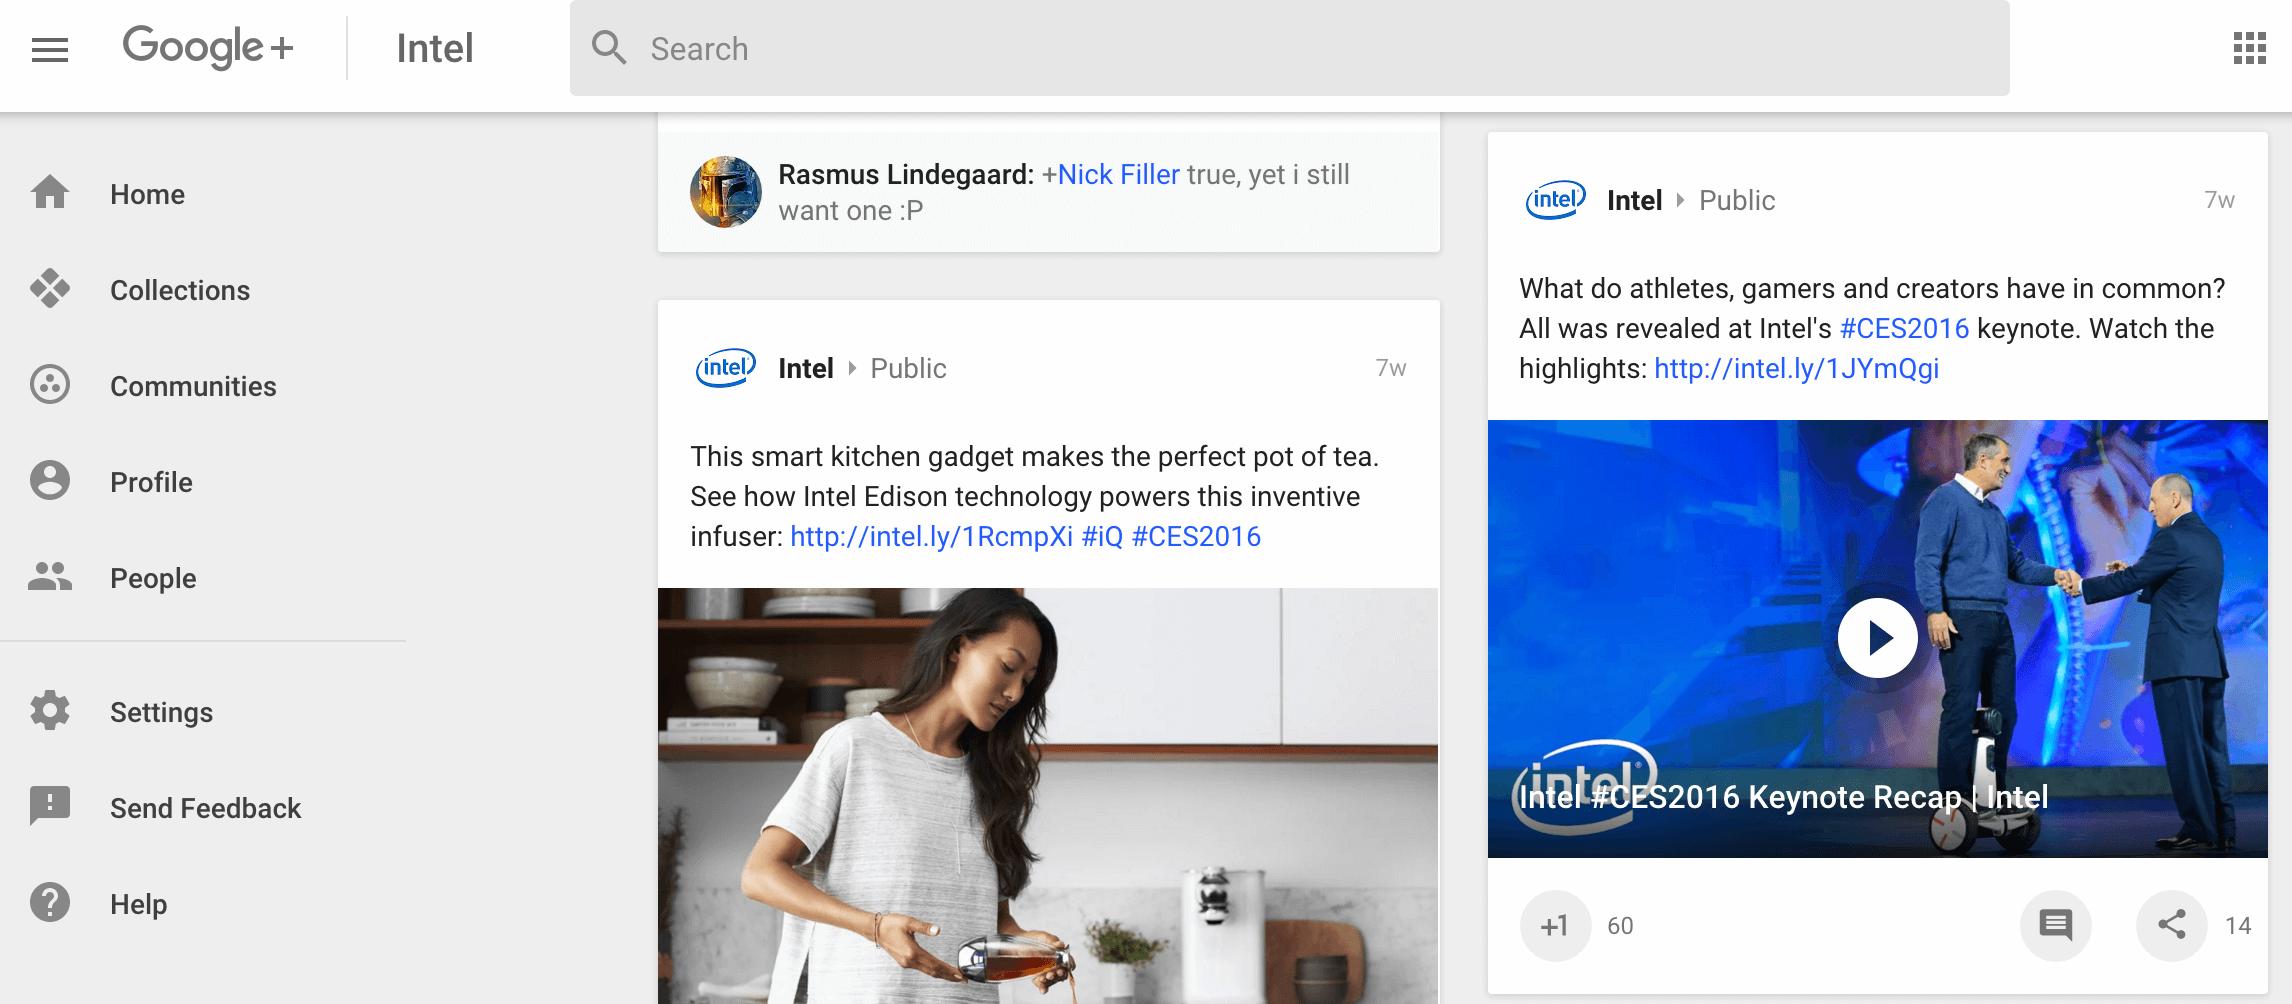 B2B Marketing Google+